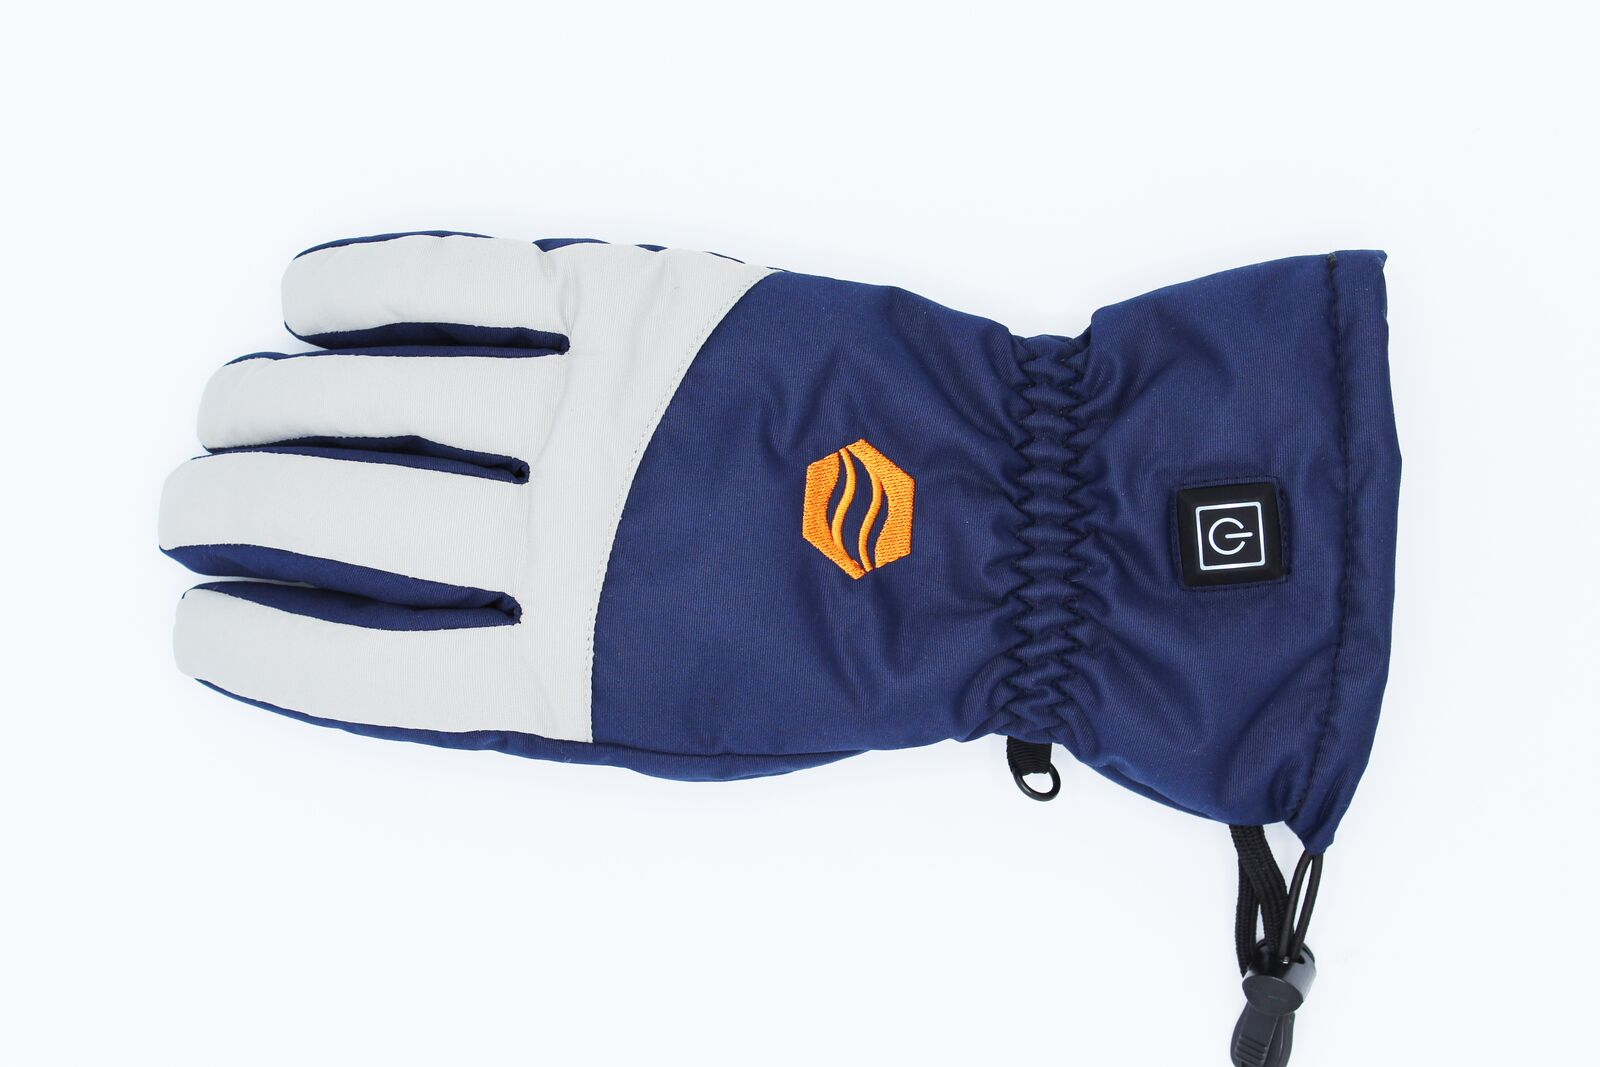 JINDEN Men WomenRechargeable Electric Heated Socks Battery Heat Thermal Sox,Sports Outdoor Winter Novelty Warm Heating Sock,Climbing Hiking Skiing Foot Boot Heater Warmer